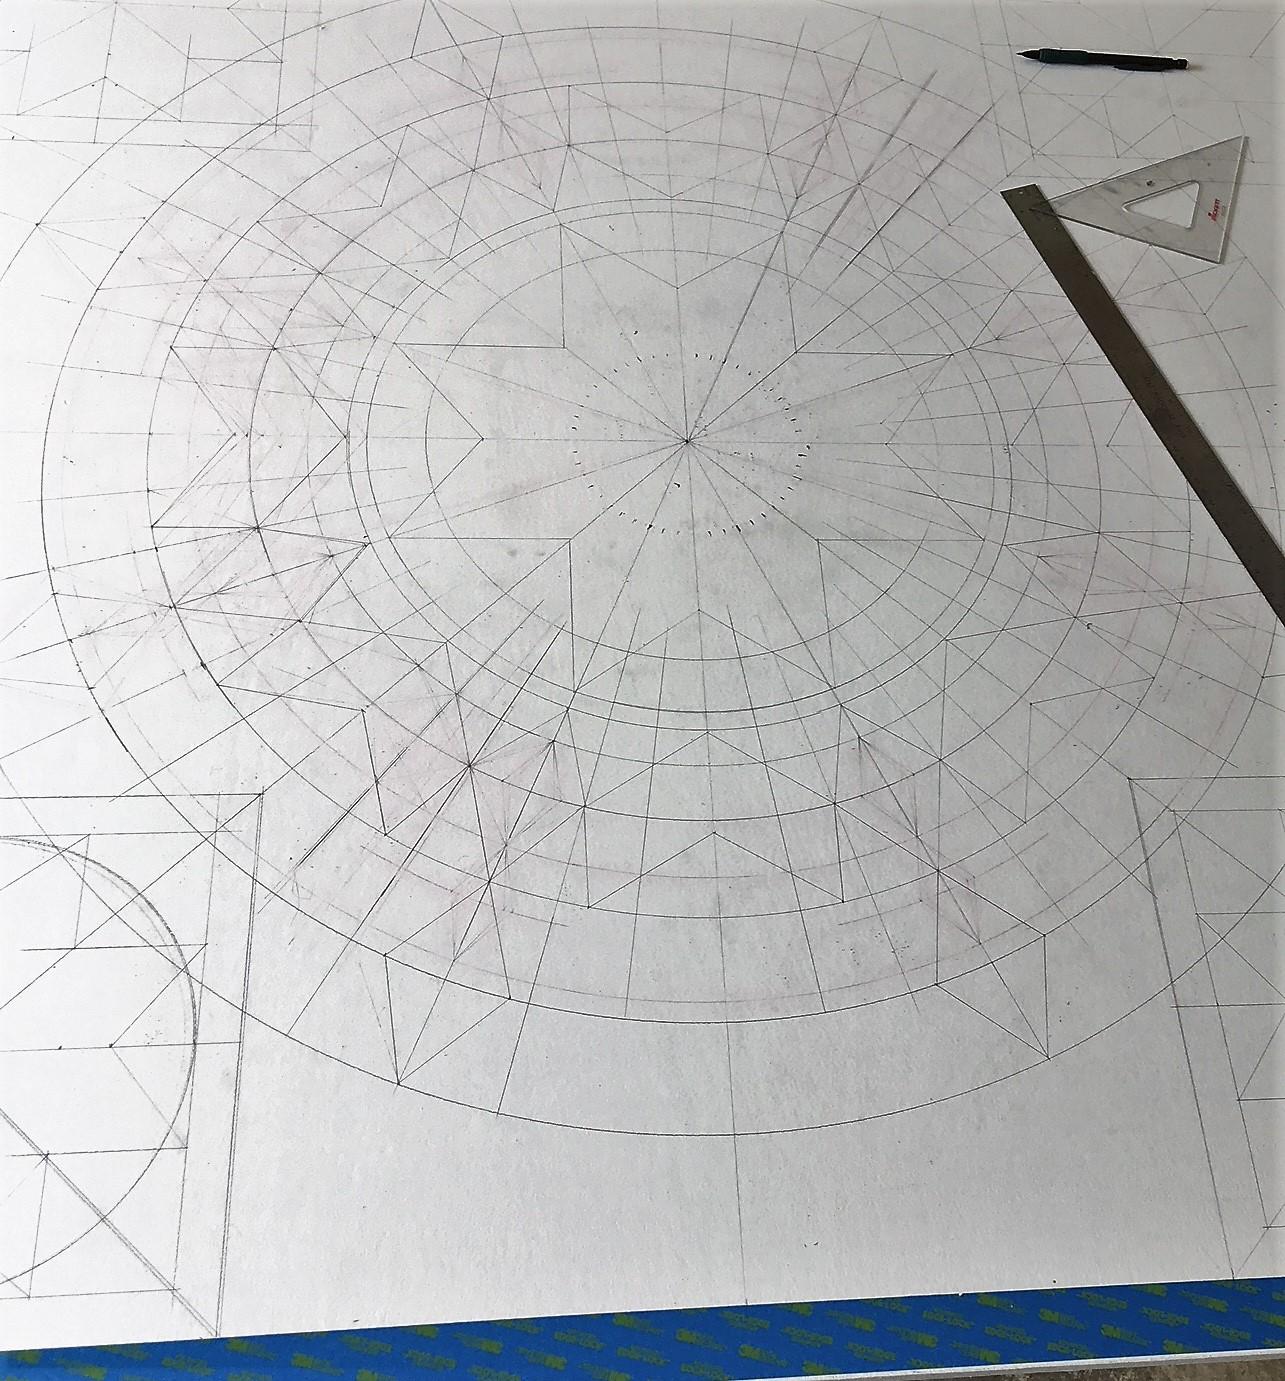 - Prairie Star Layout Drawing